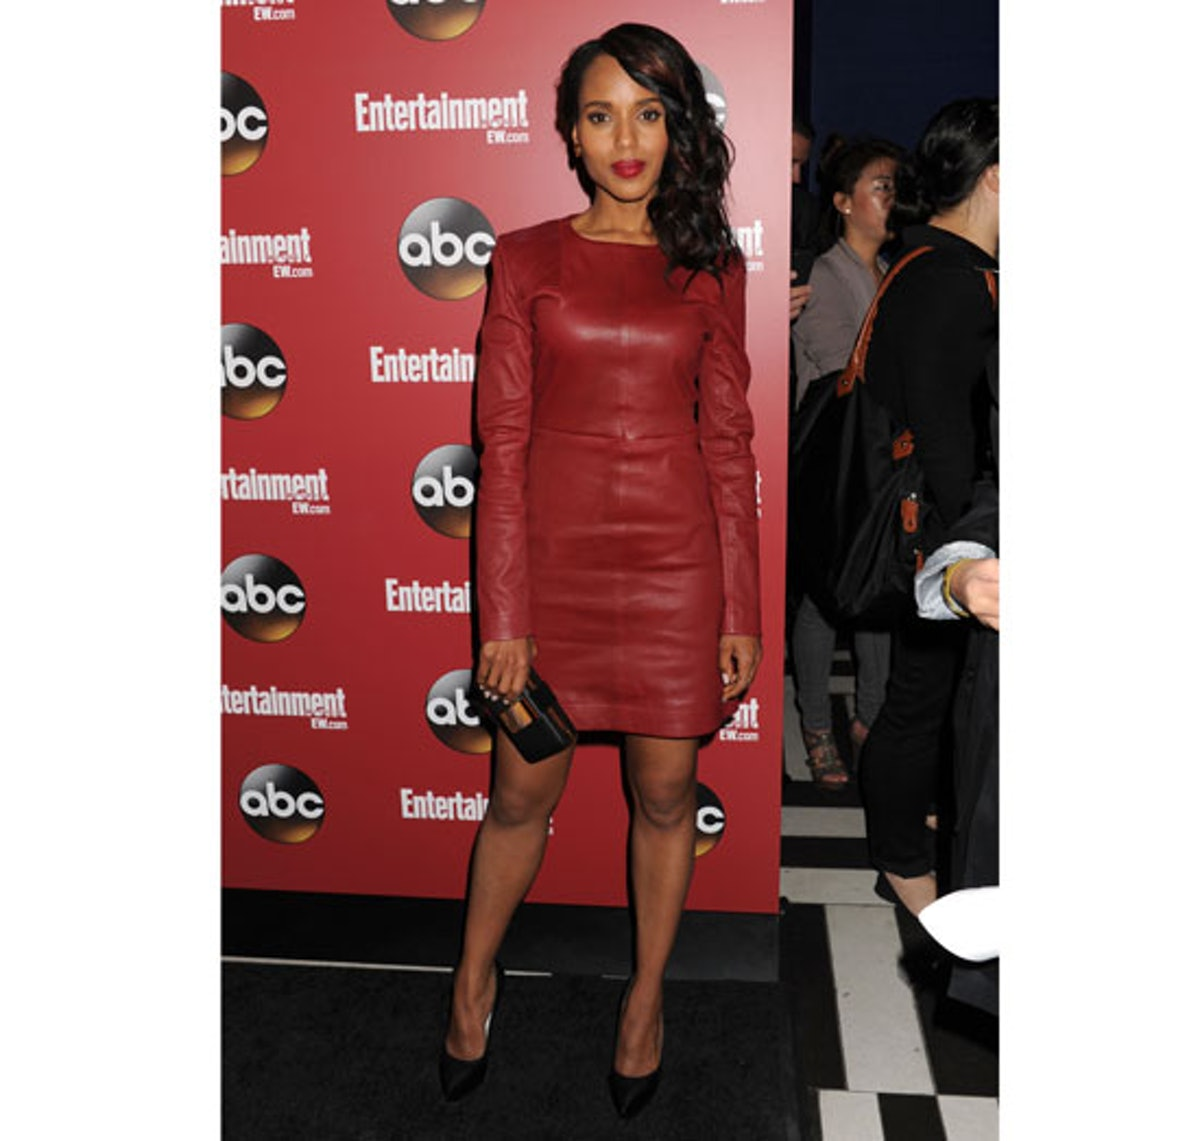 blog-kerry-washington-red-marc-by-marc-jacobs-dress.jpg